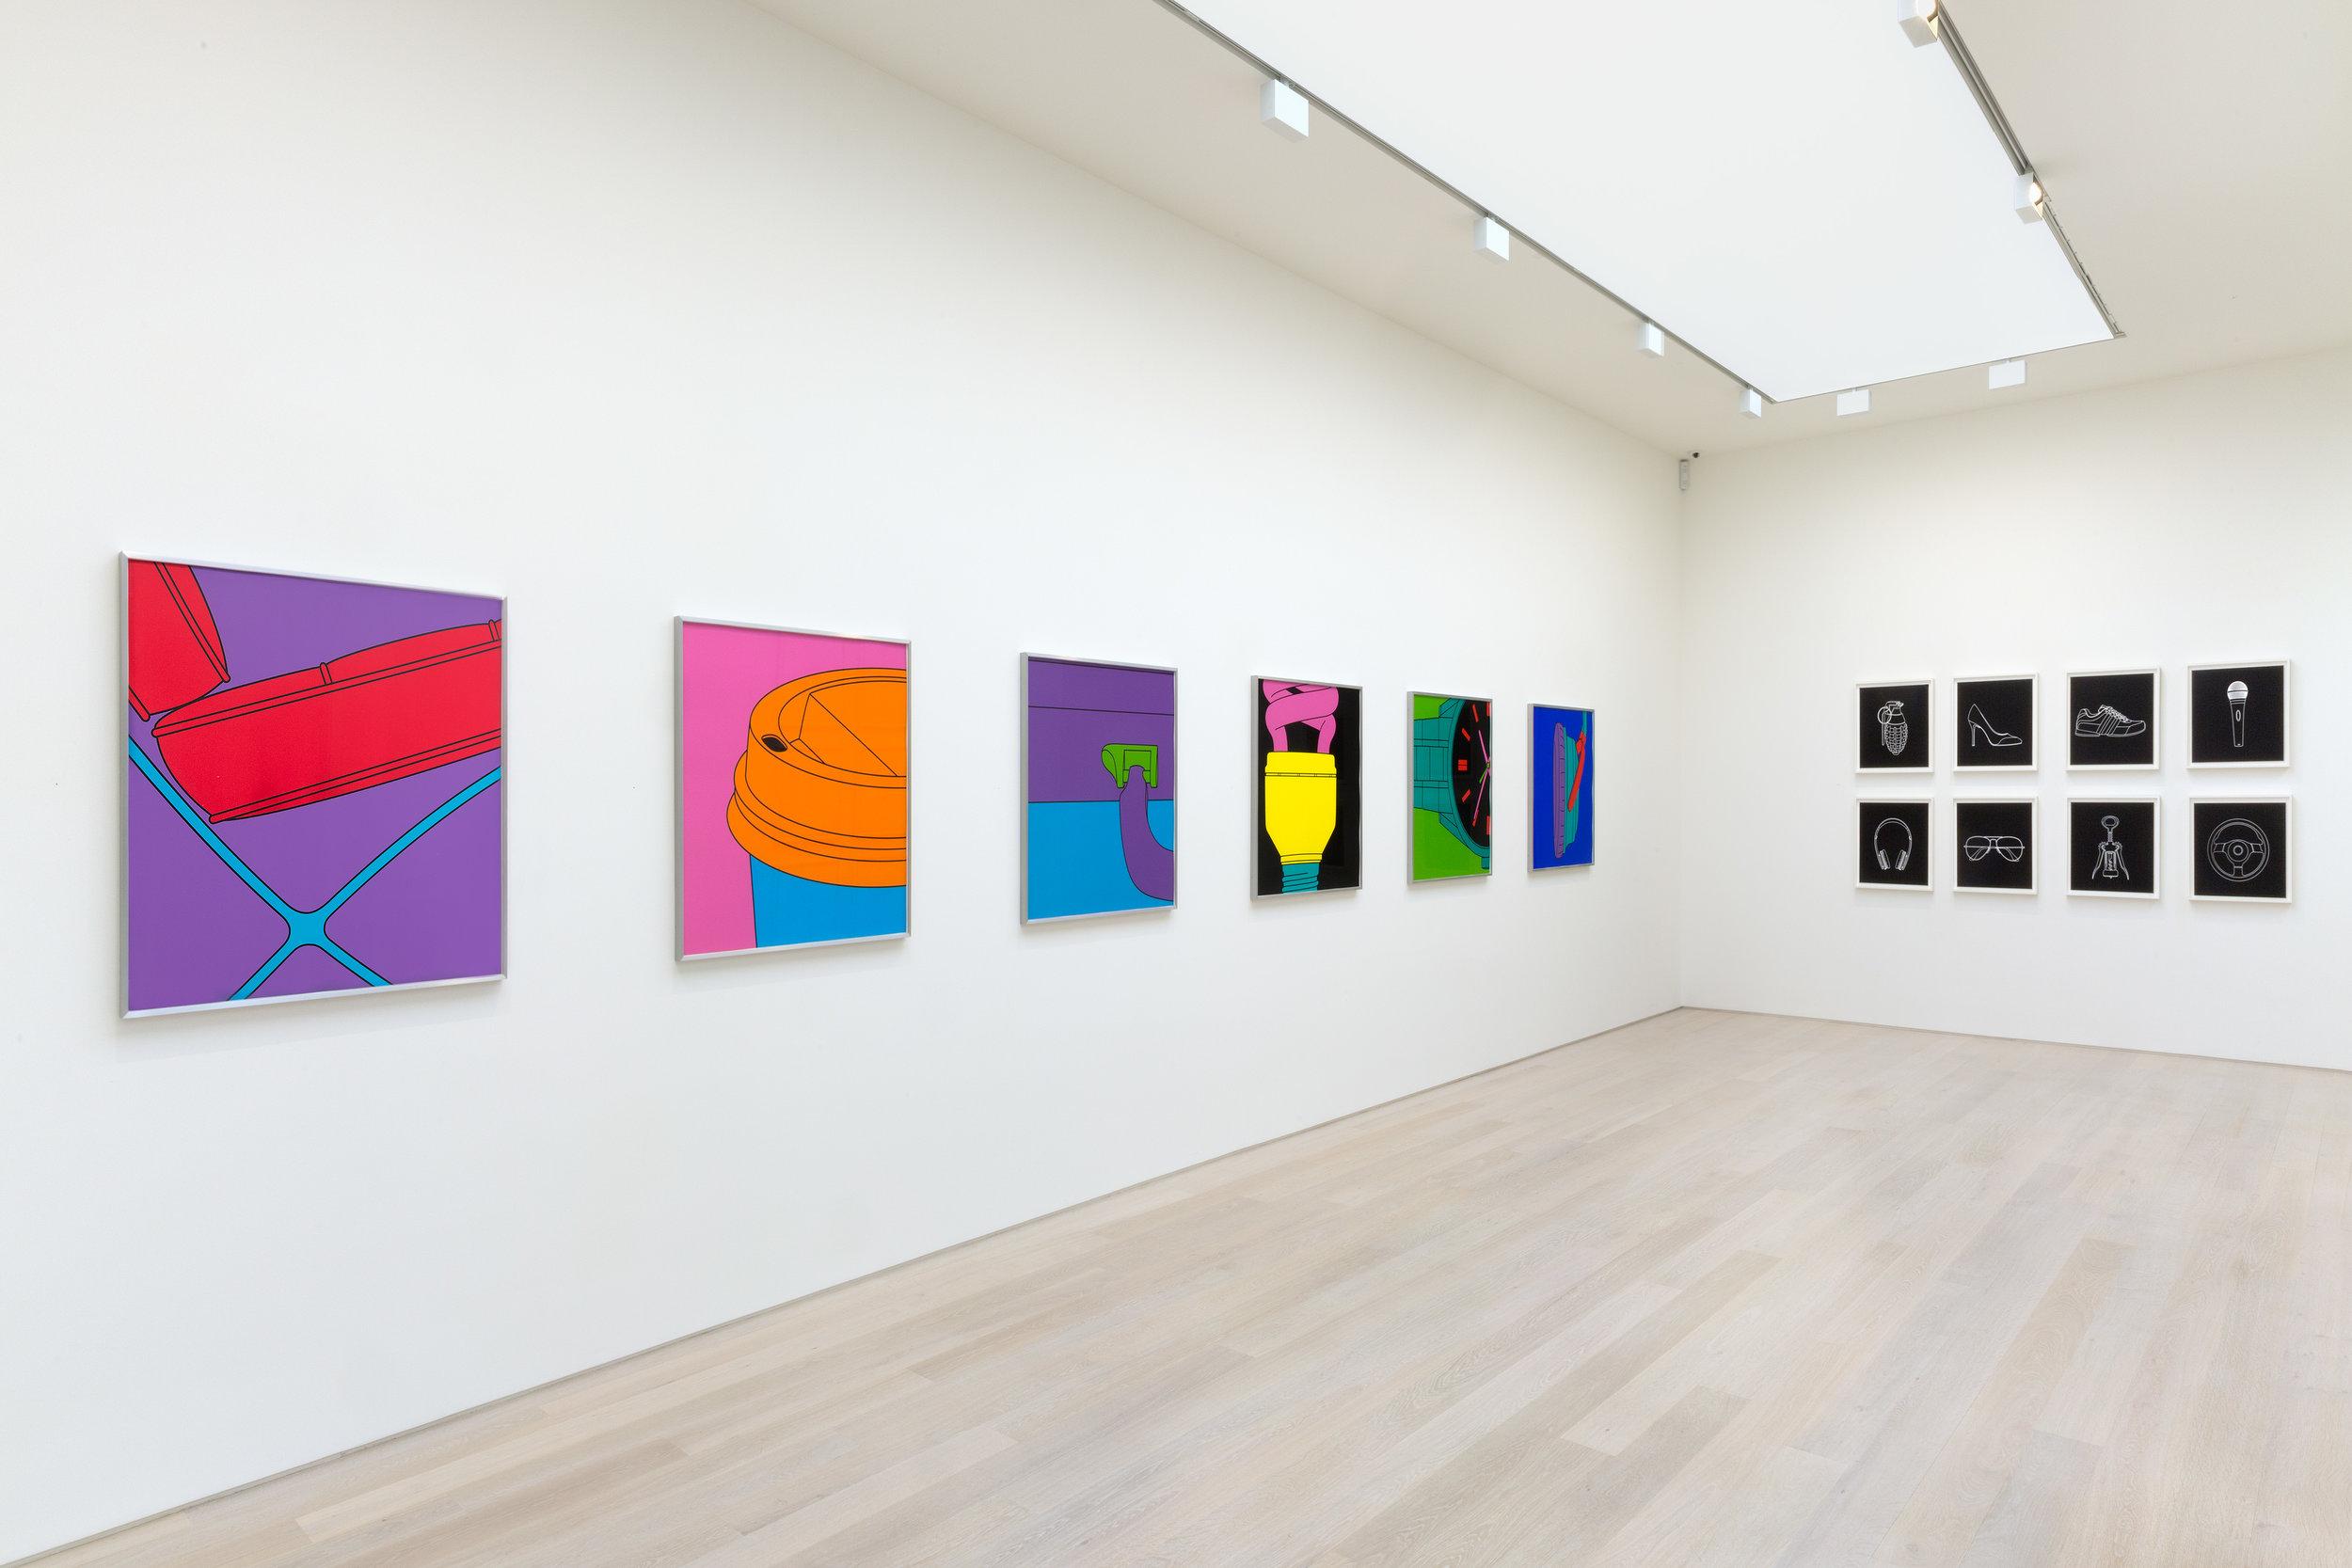 Michael Craig-Martin Quotidian_Alan Cristea Gallery 2017 installation. Photo FXP Photography (4)~hi.jpg